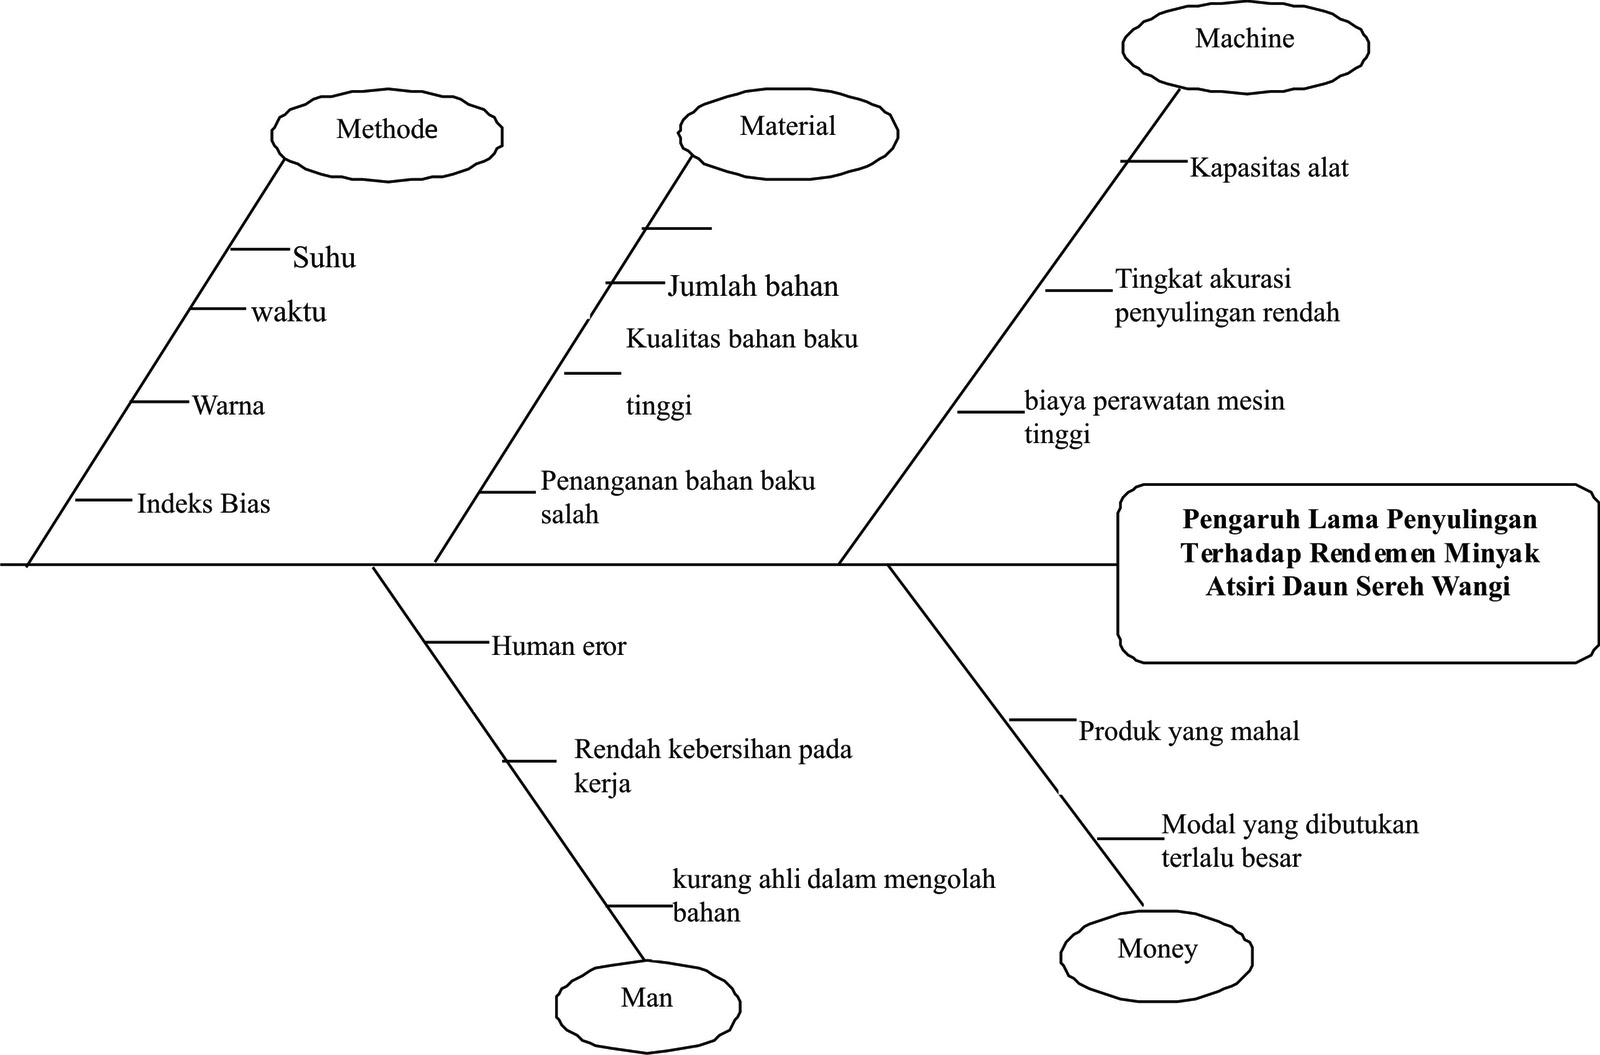 Informasi agroindustri proses penyuligan minyak atsiri daun sereh wangi gambar diagram tulang ikan fish bone ccuart Images